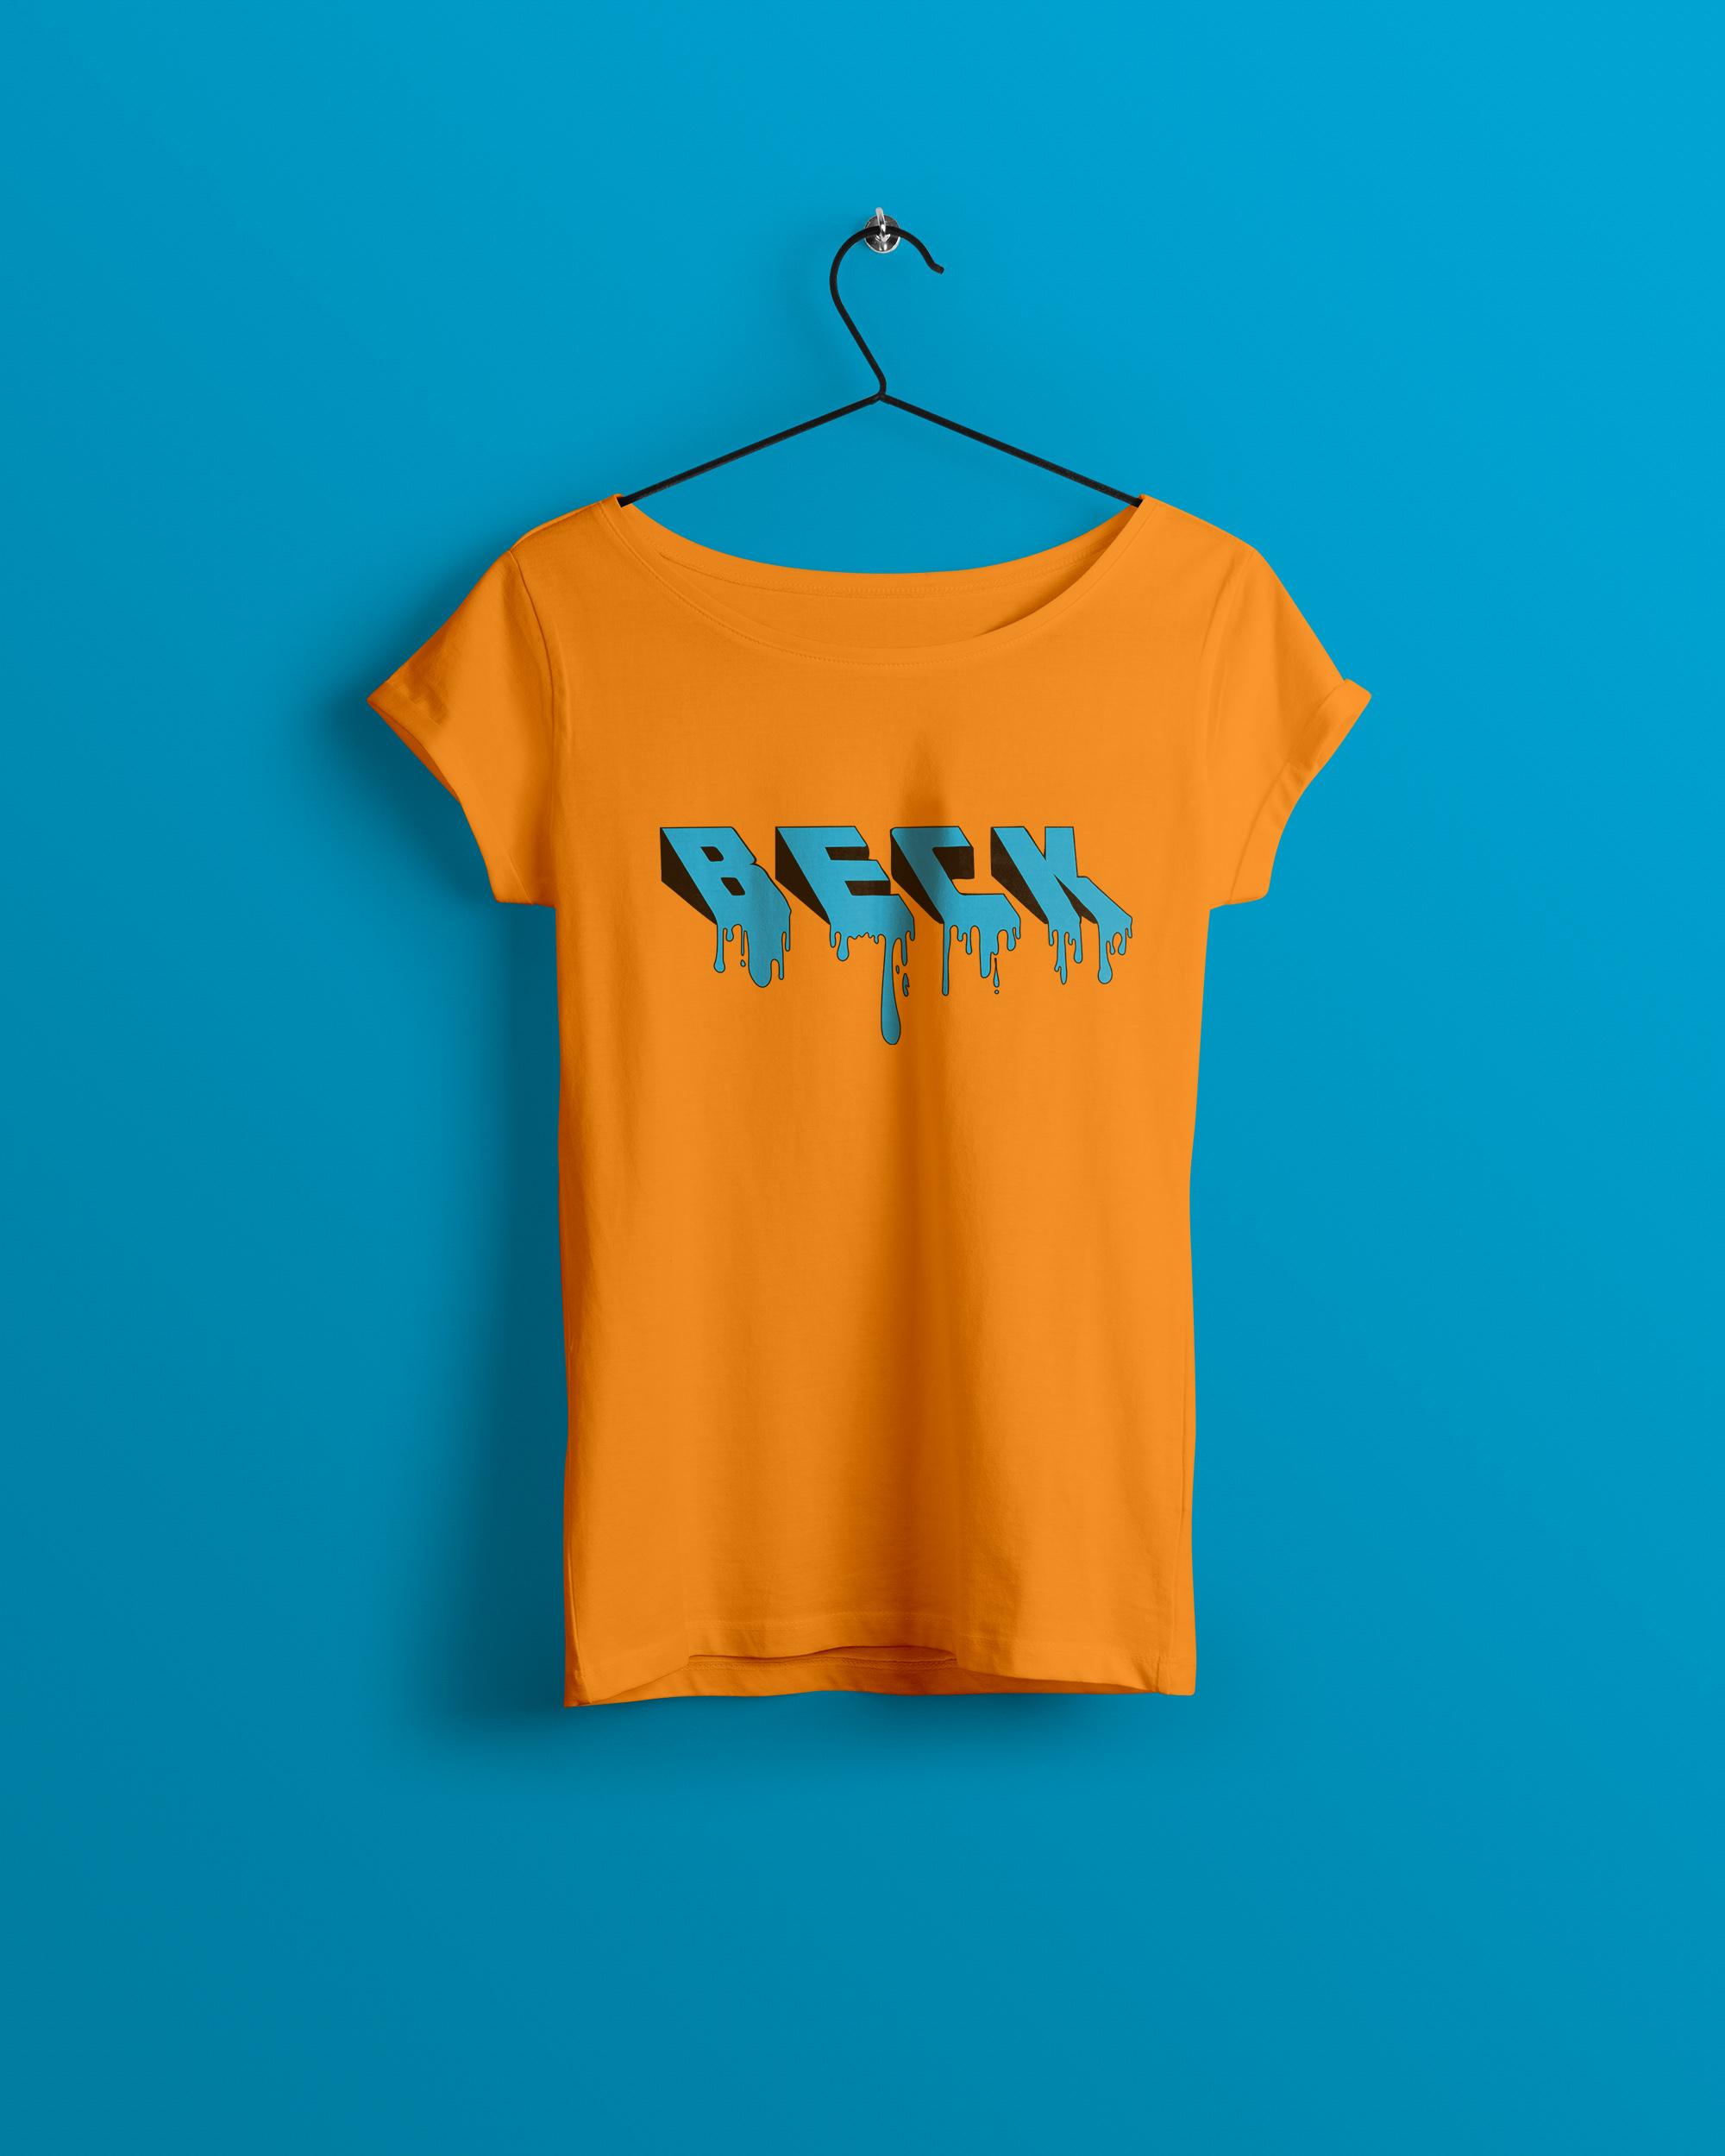 beck-drip-hanging.jpg